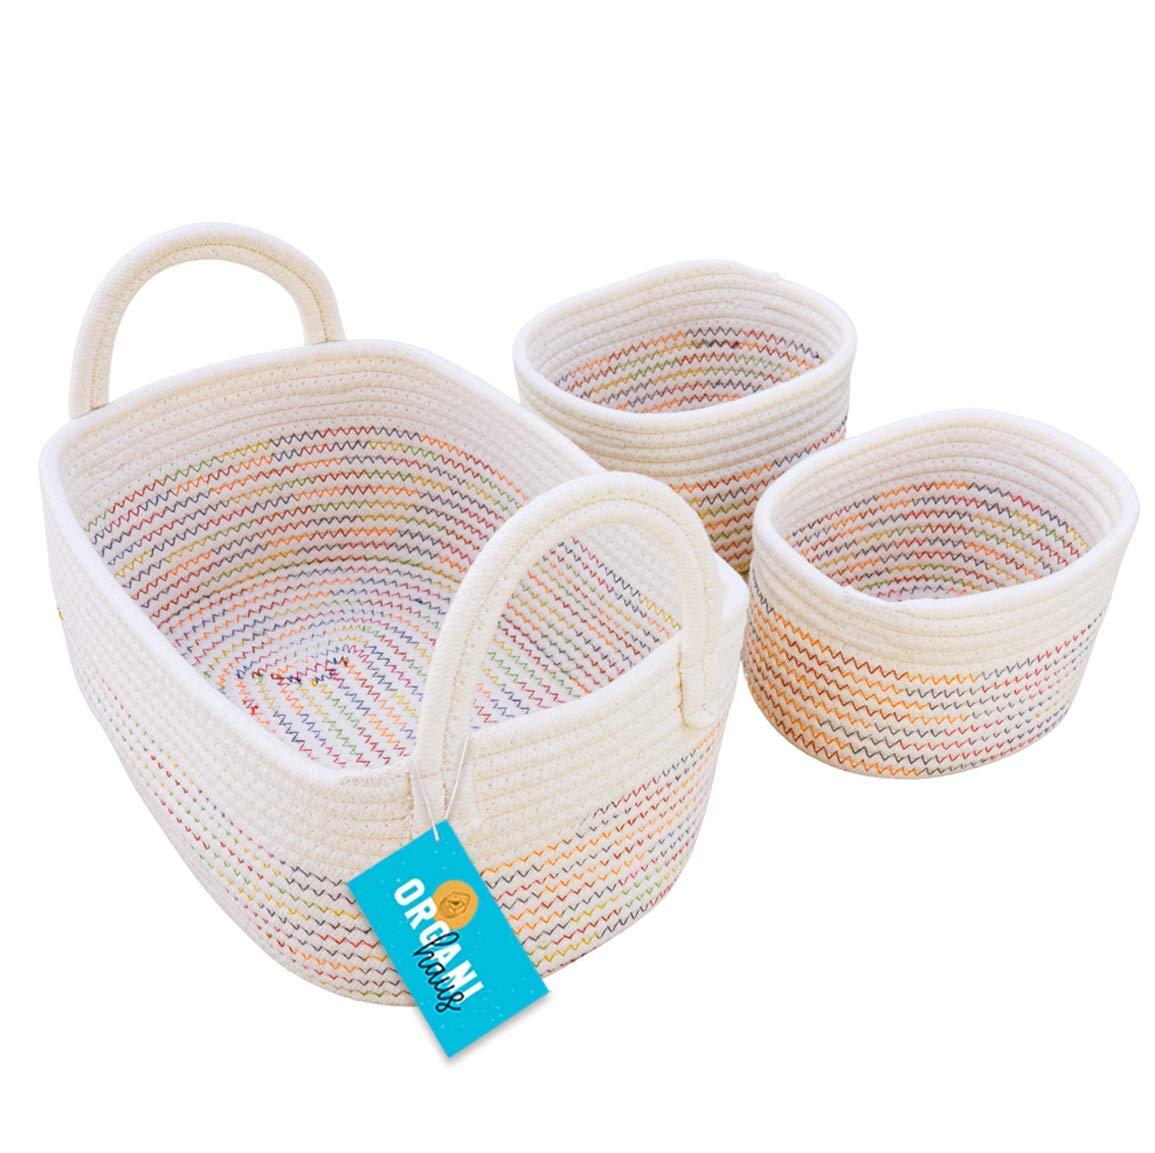 Rainbow Rope Baskets